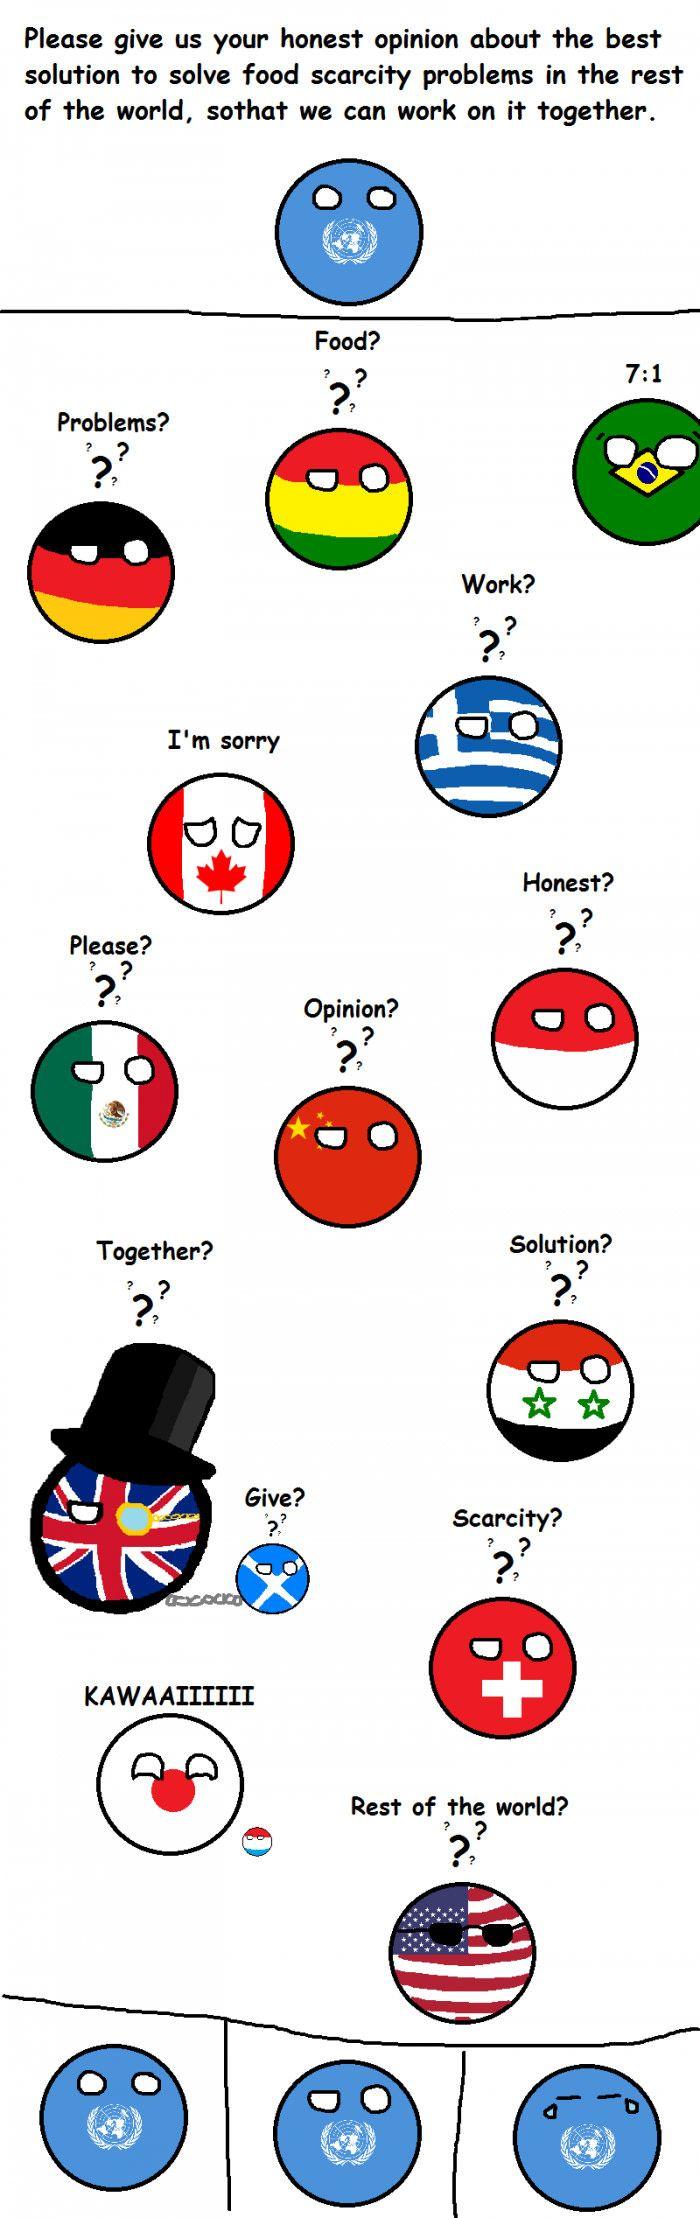 Poor UN (Canada, Poland, China, Syria, USA, UK, Scotland, Japan, Switzerland, Greece, Germany, Mexico, Luxembourg, Bolivia, Brazil, UN)